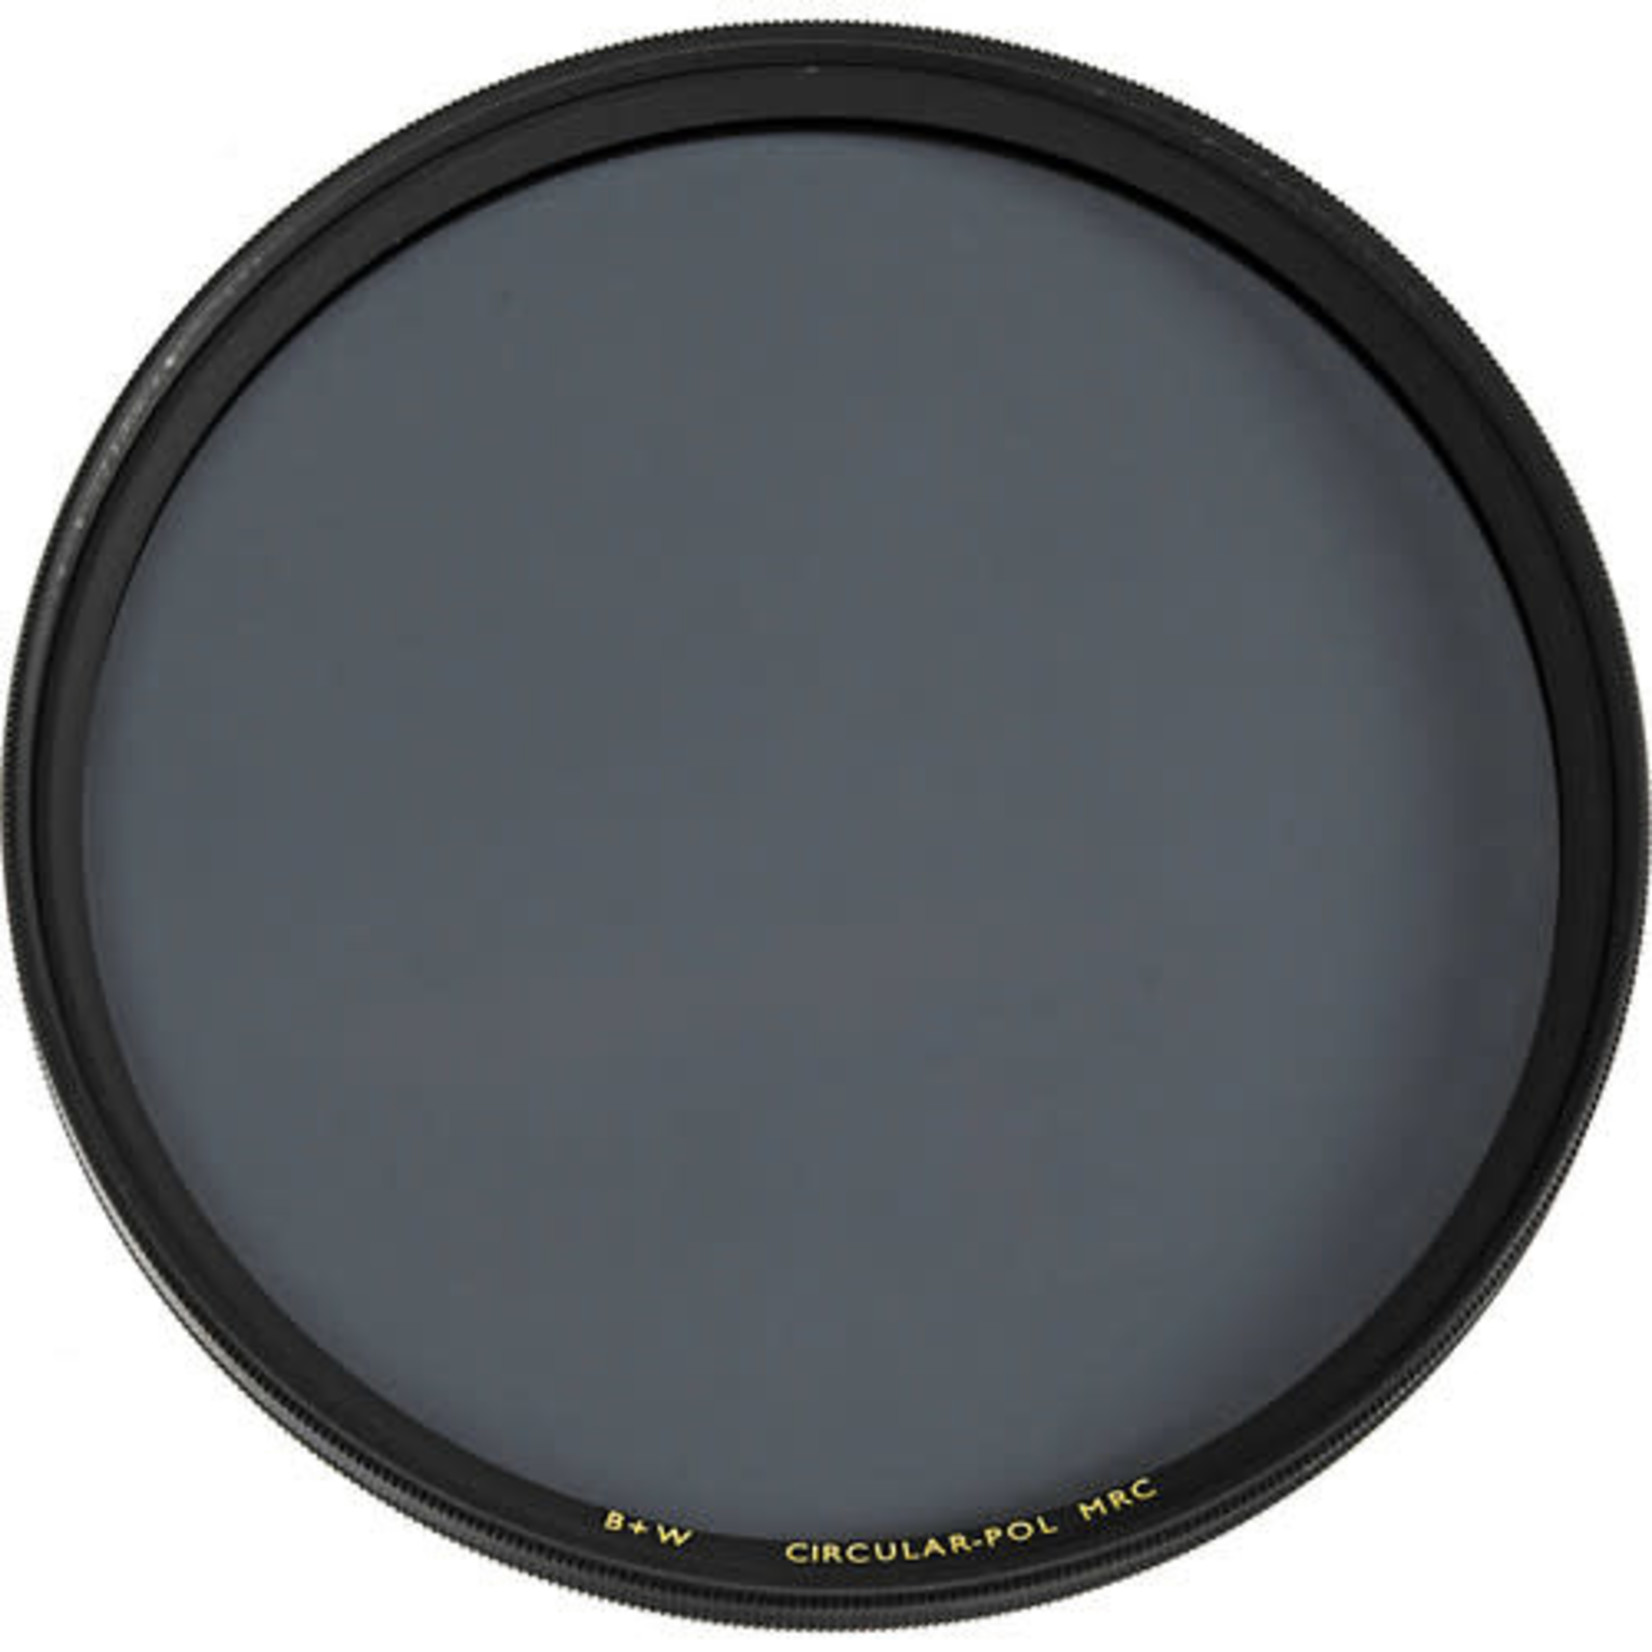 B+W B+W 49mm Circular Polarizer MRC Filter